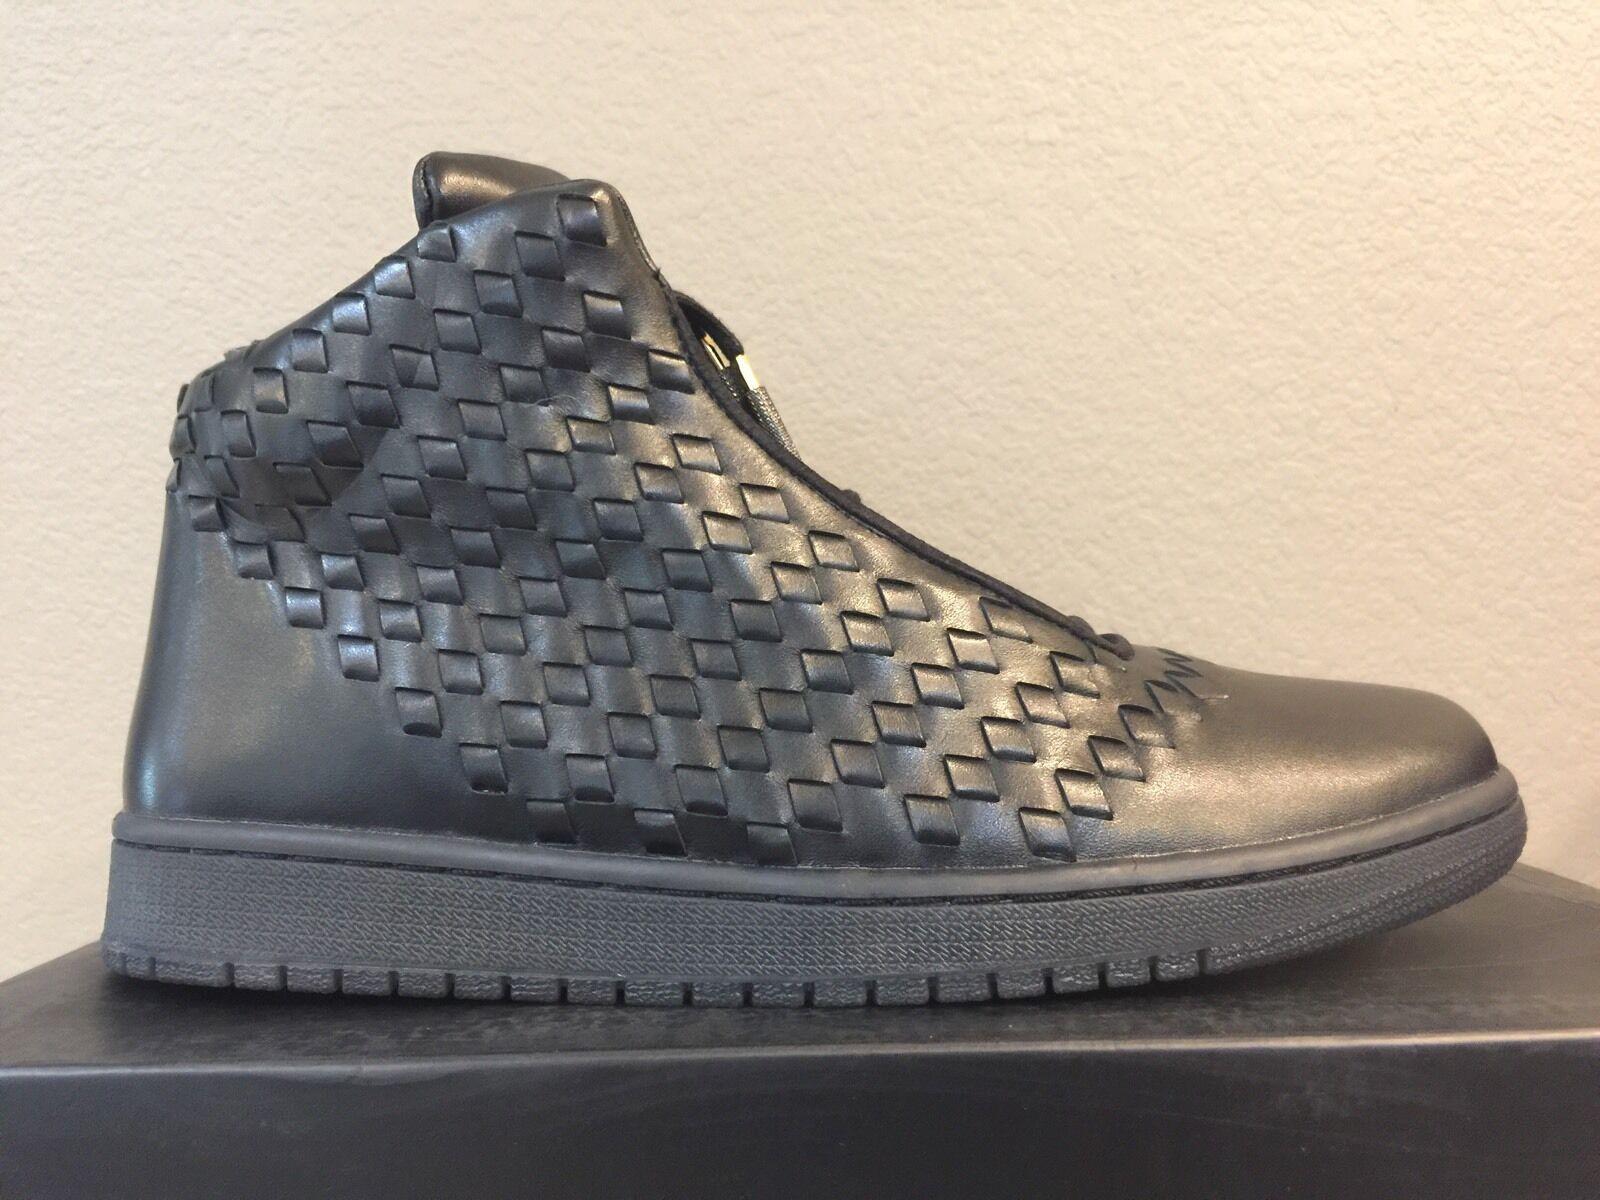 Air Jordan Shine Black Size 10.5 [689480 010]